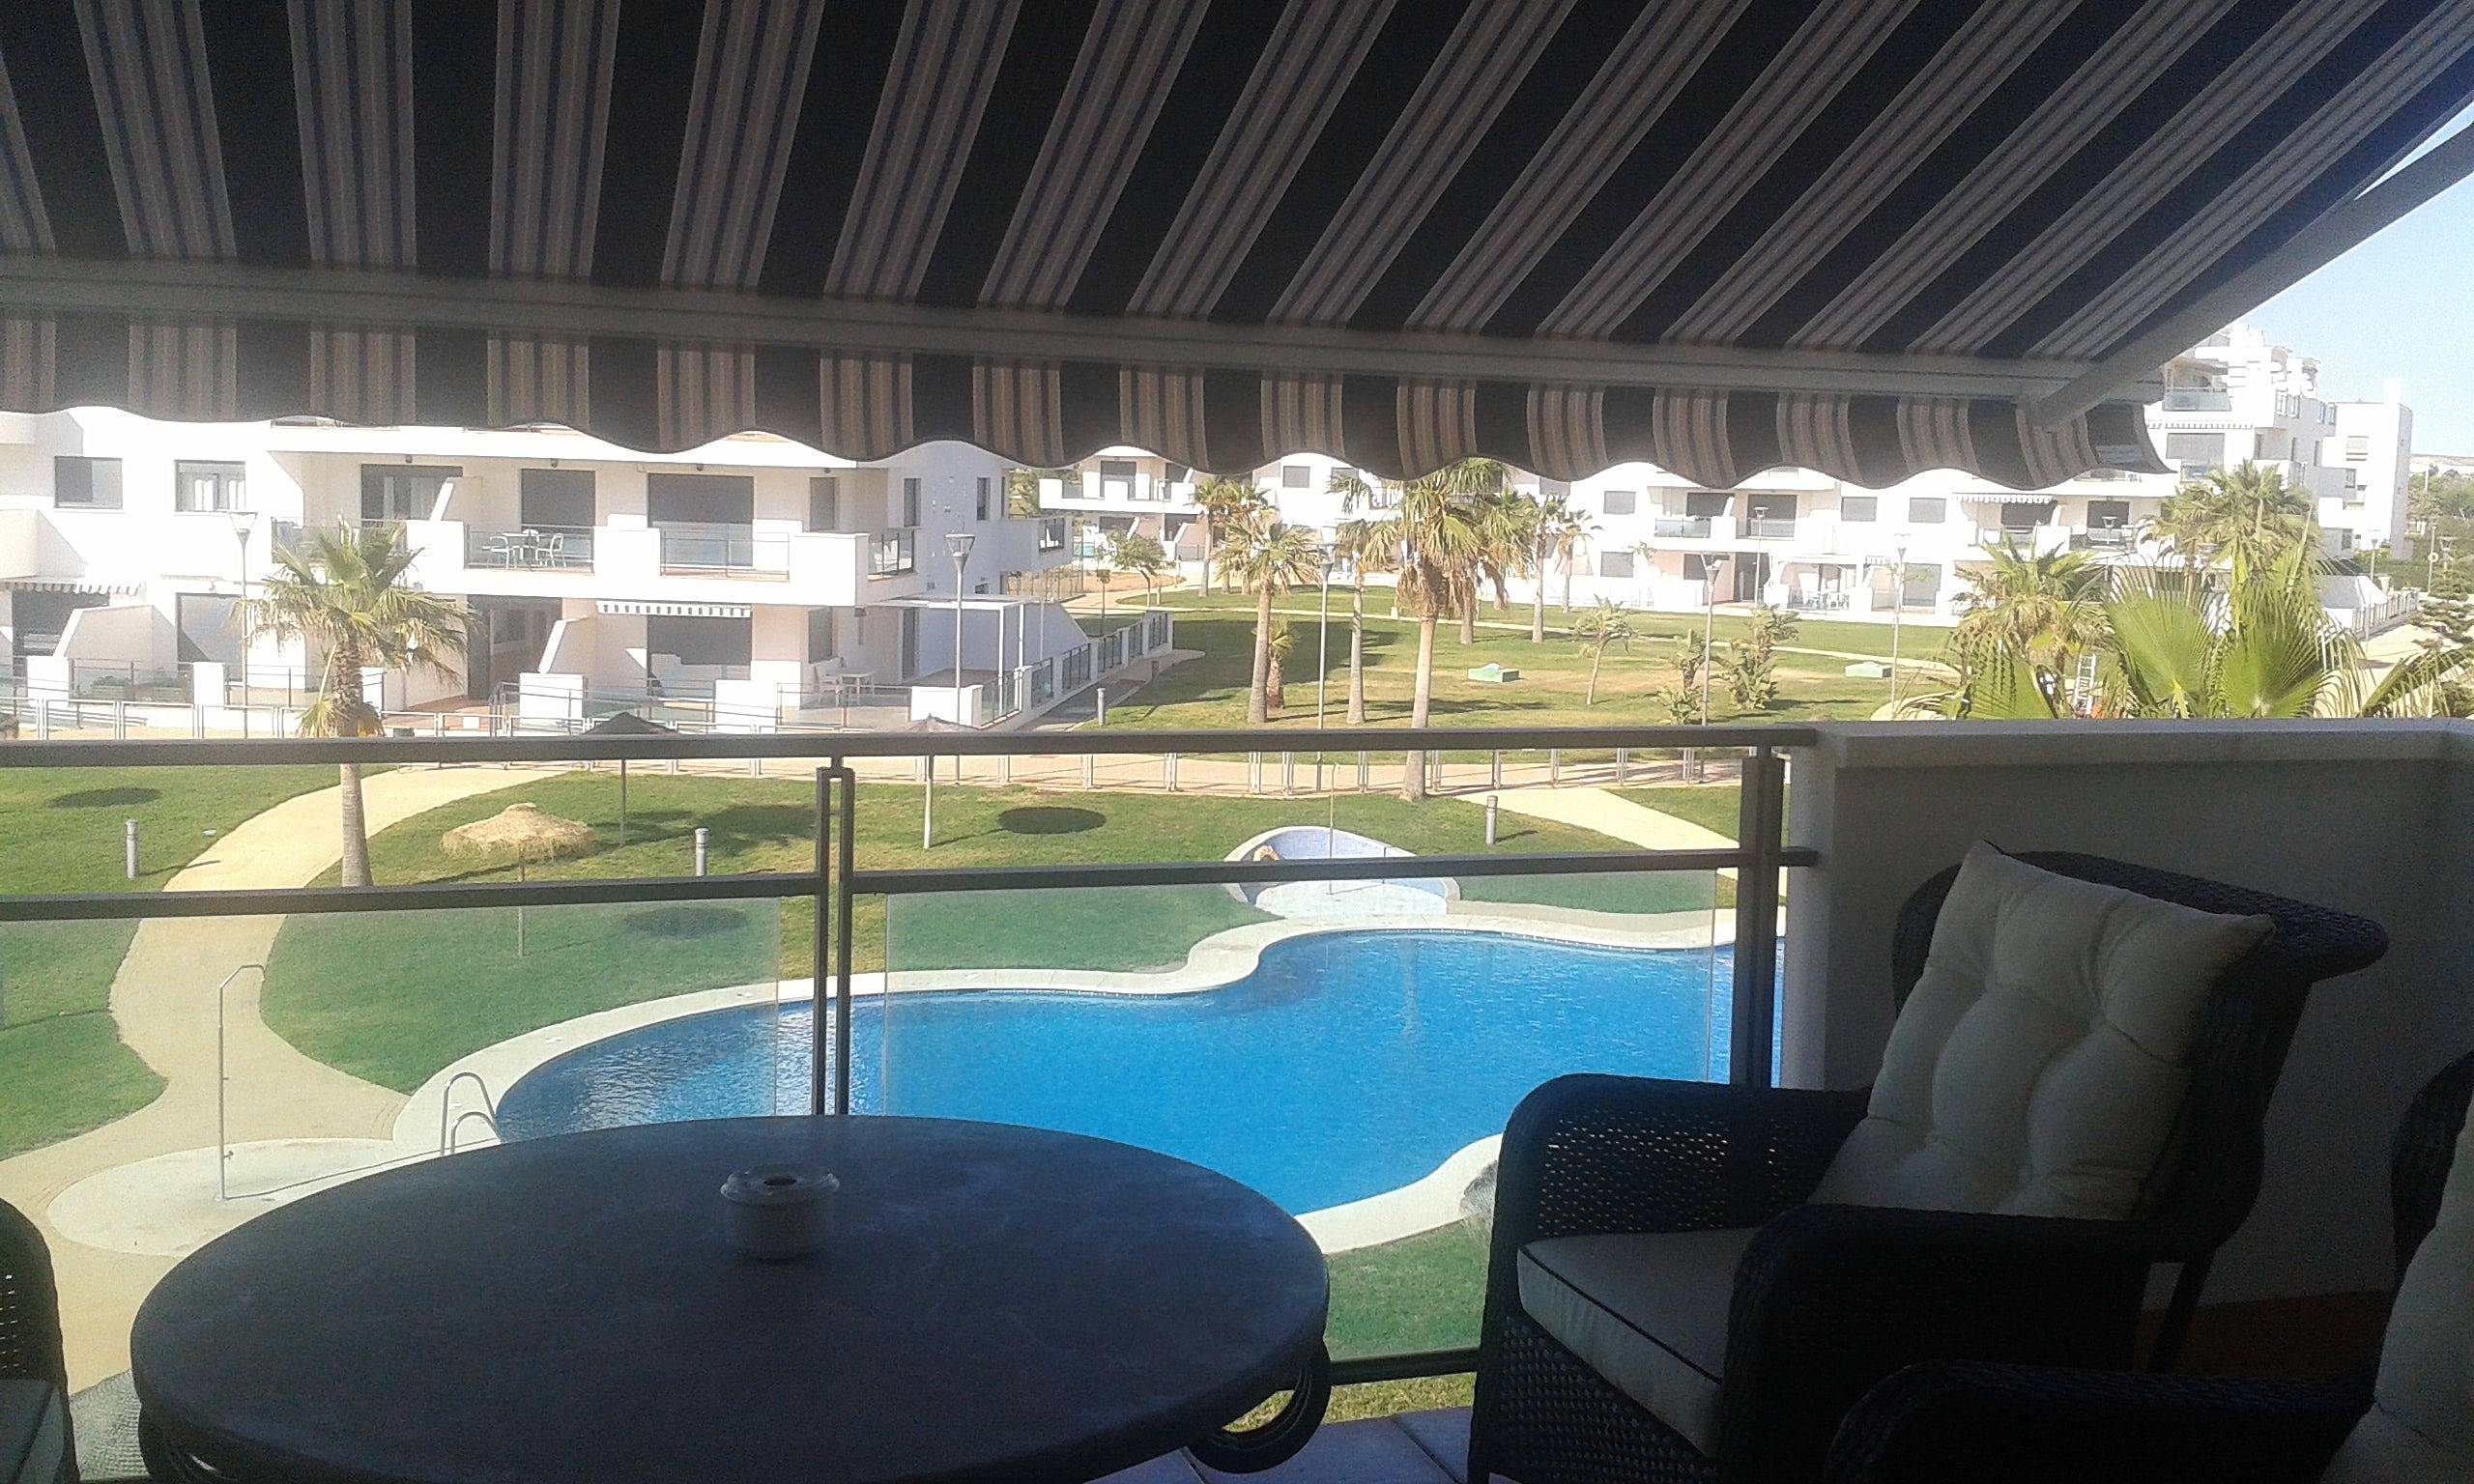 Bonito apt con acceso piscina retamar almer a almer a for Piscinas almeria